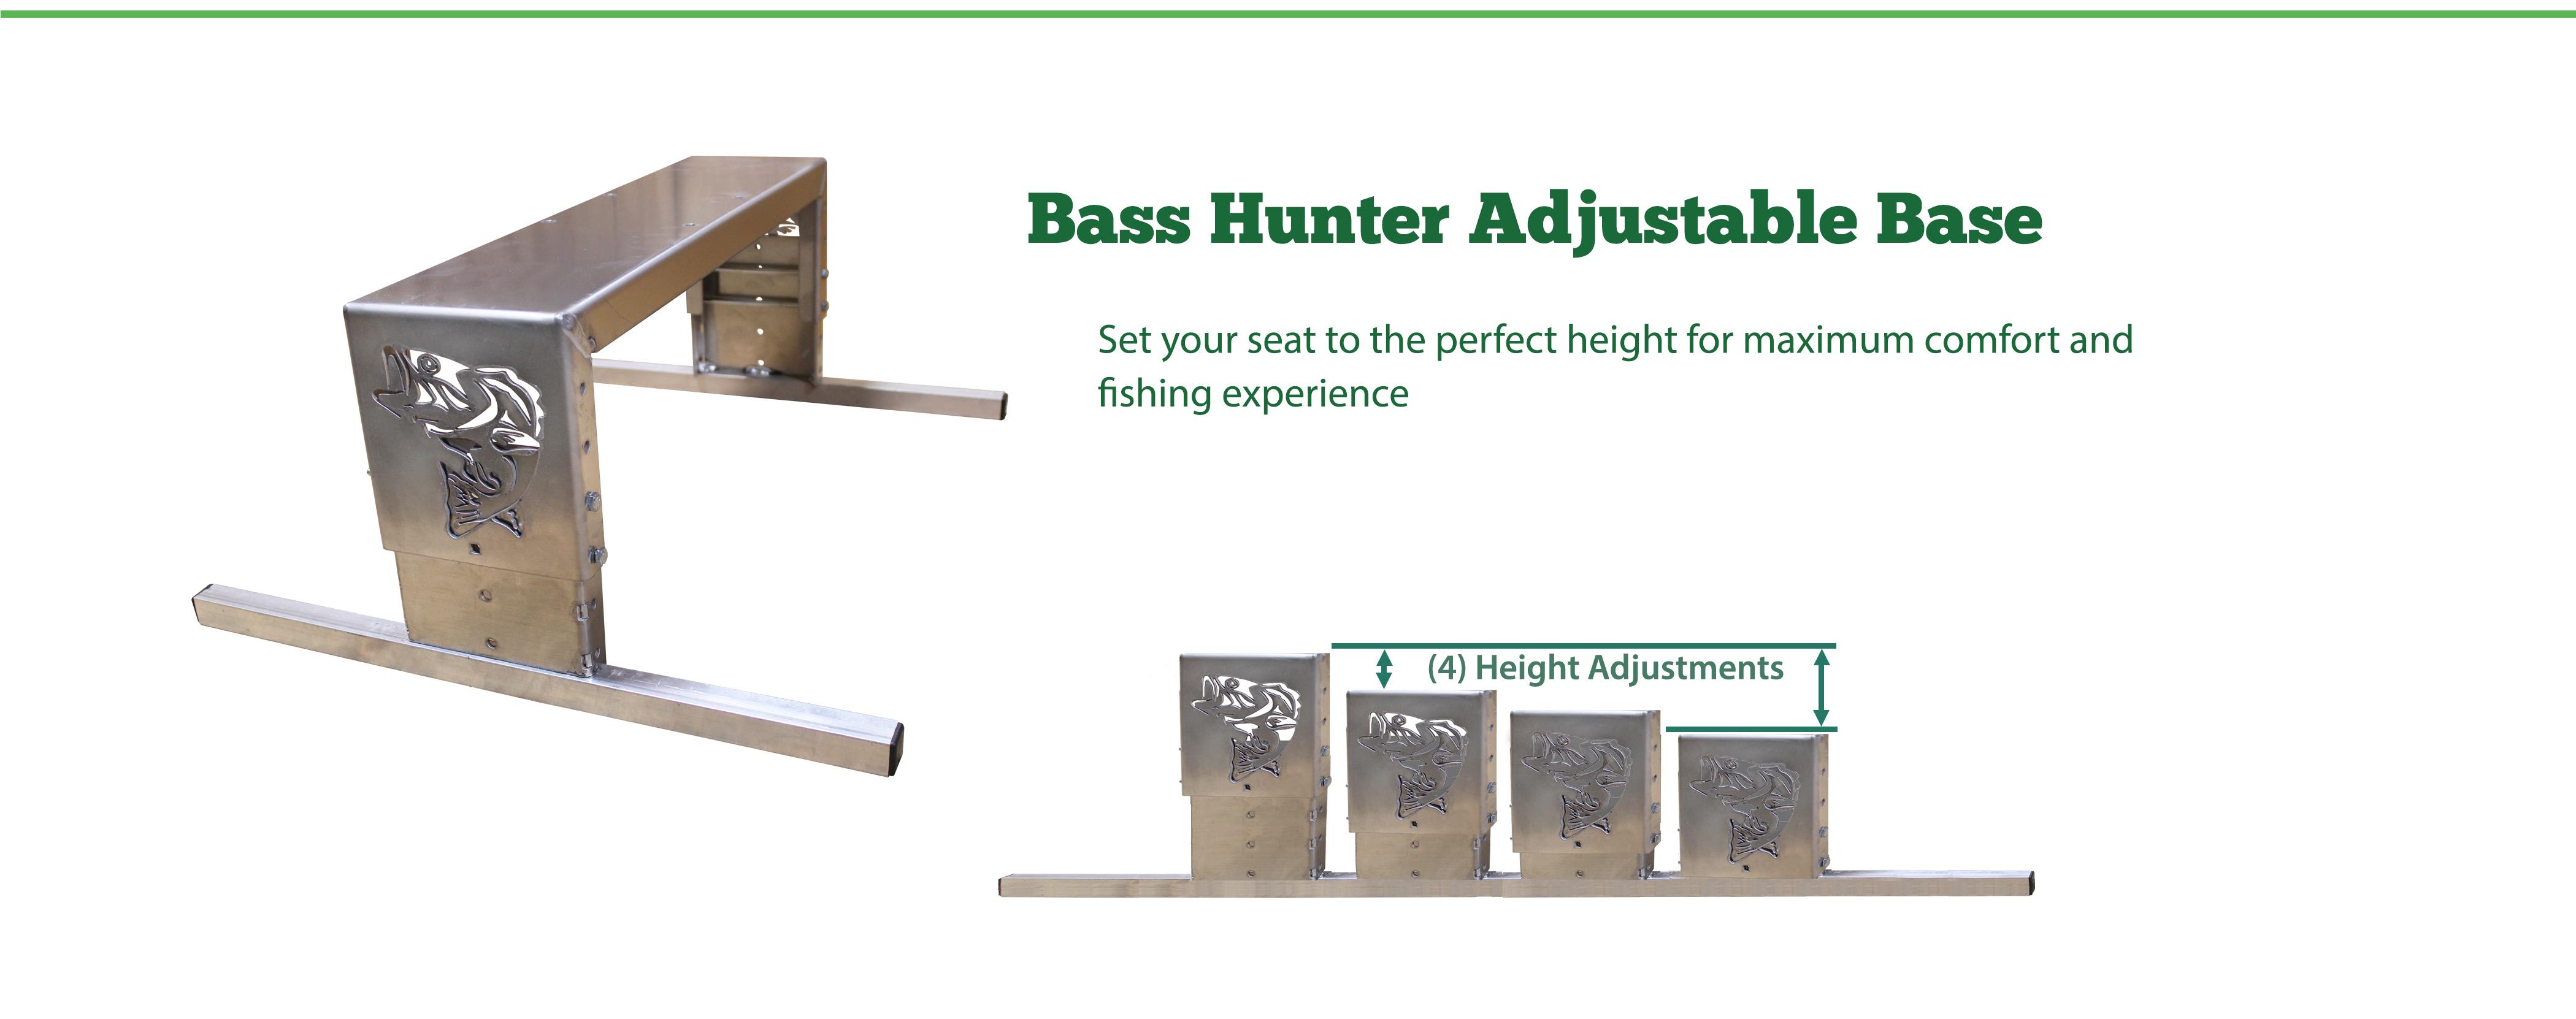 Bass Hunter Adjustable Base